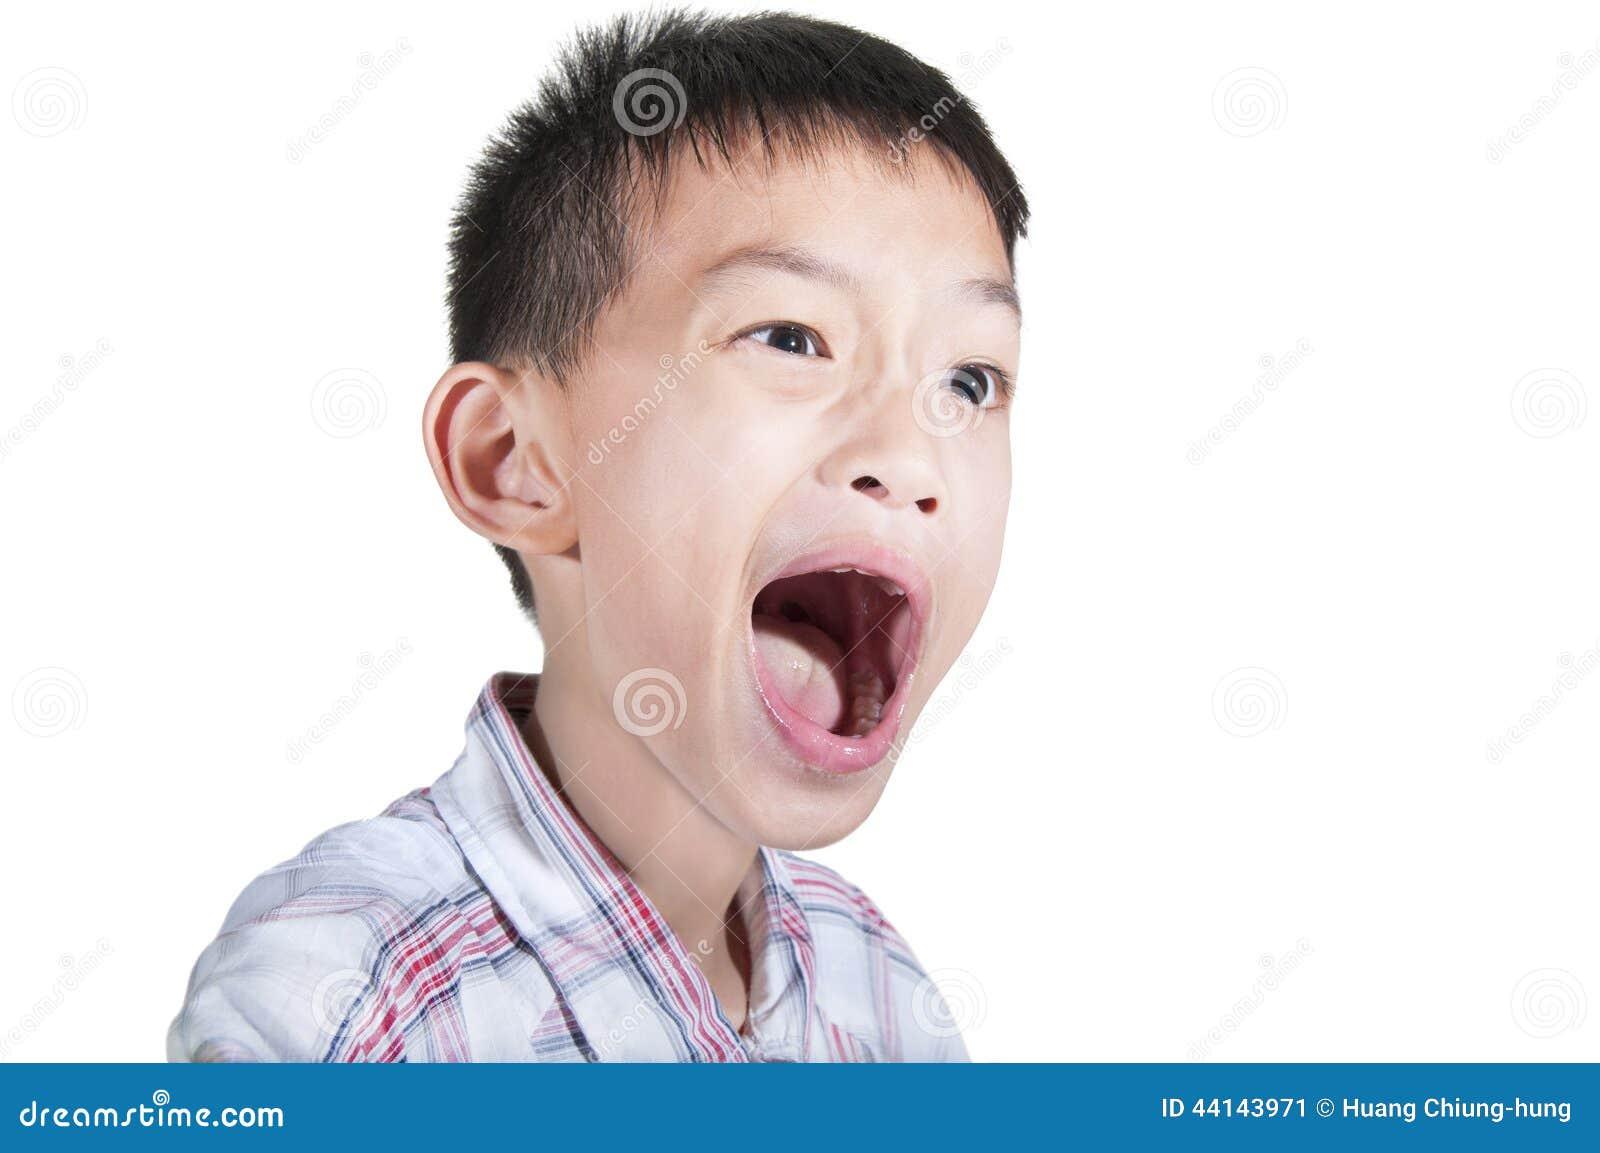 Boy surprised expression